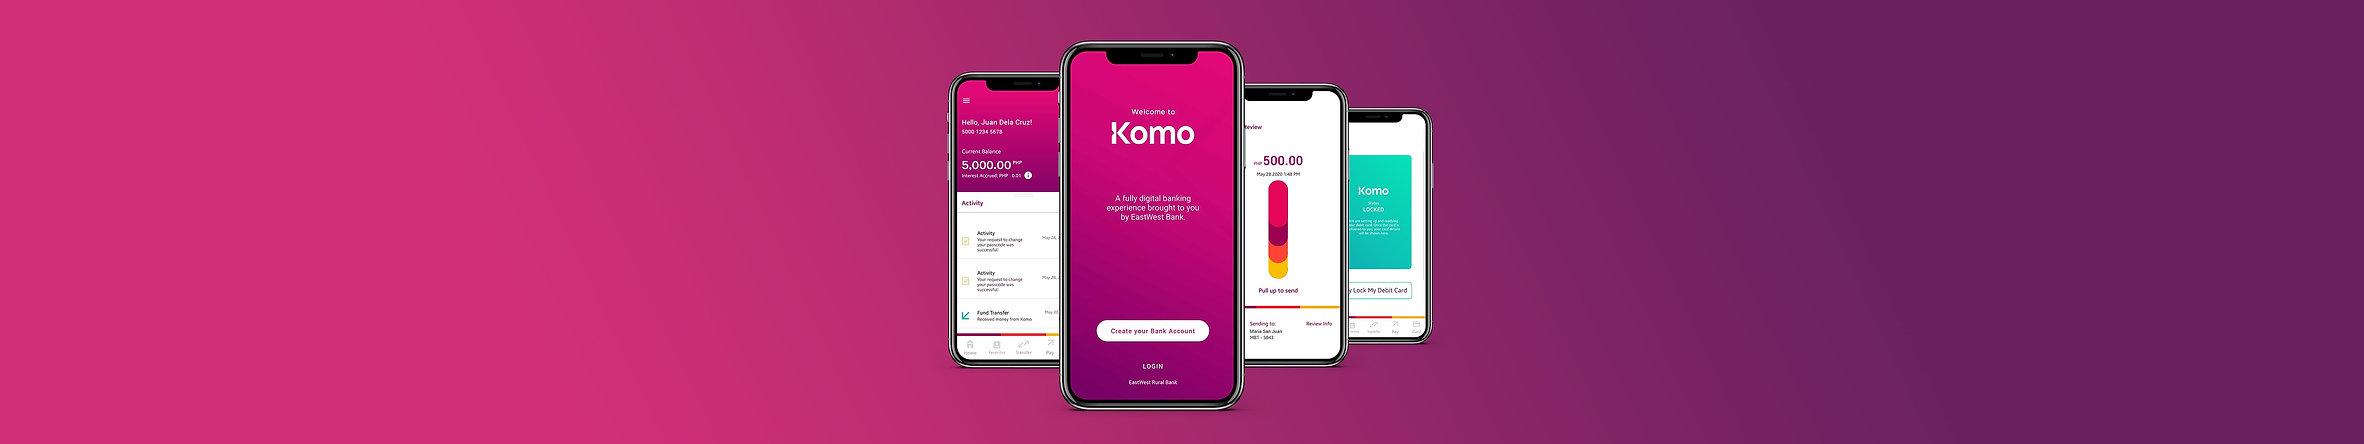 Komo - Getting Started Banner.jpg